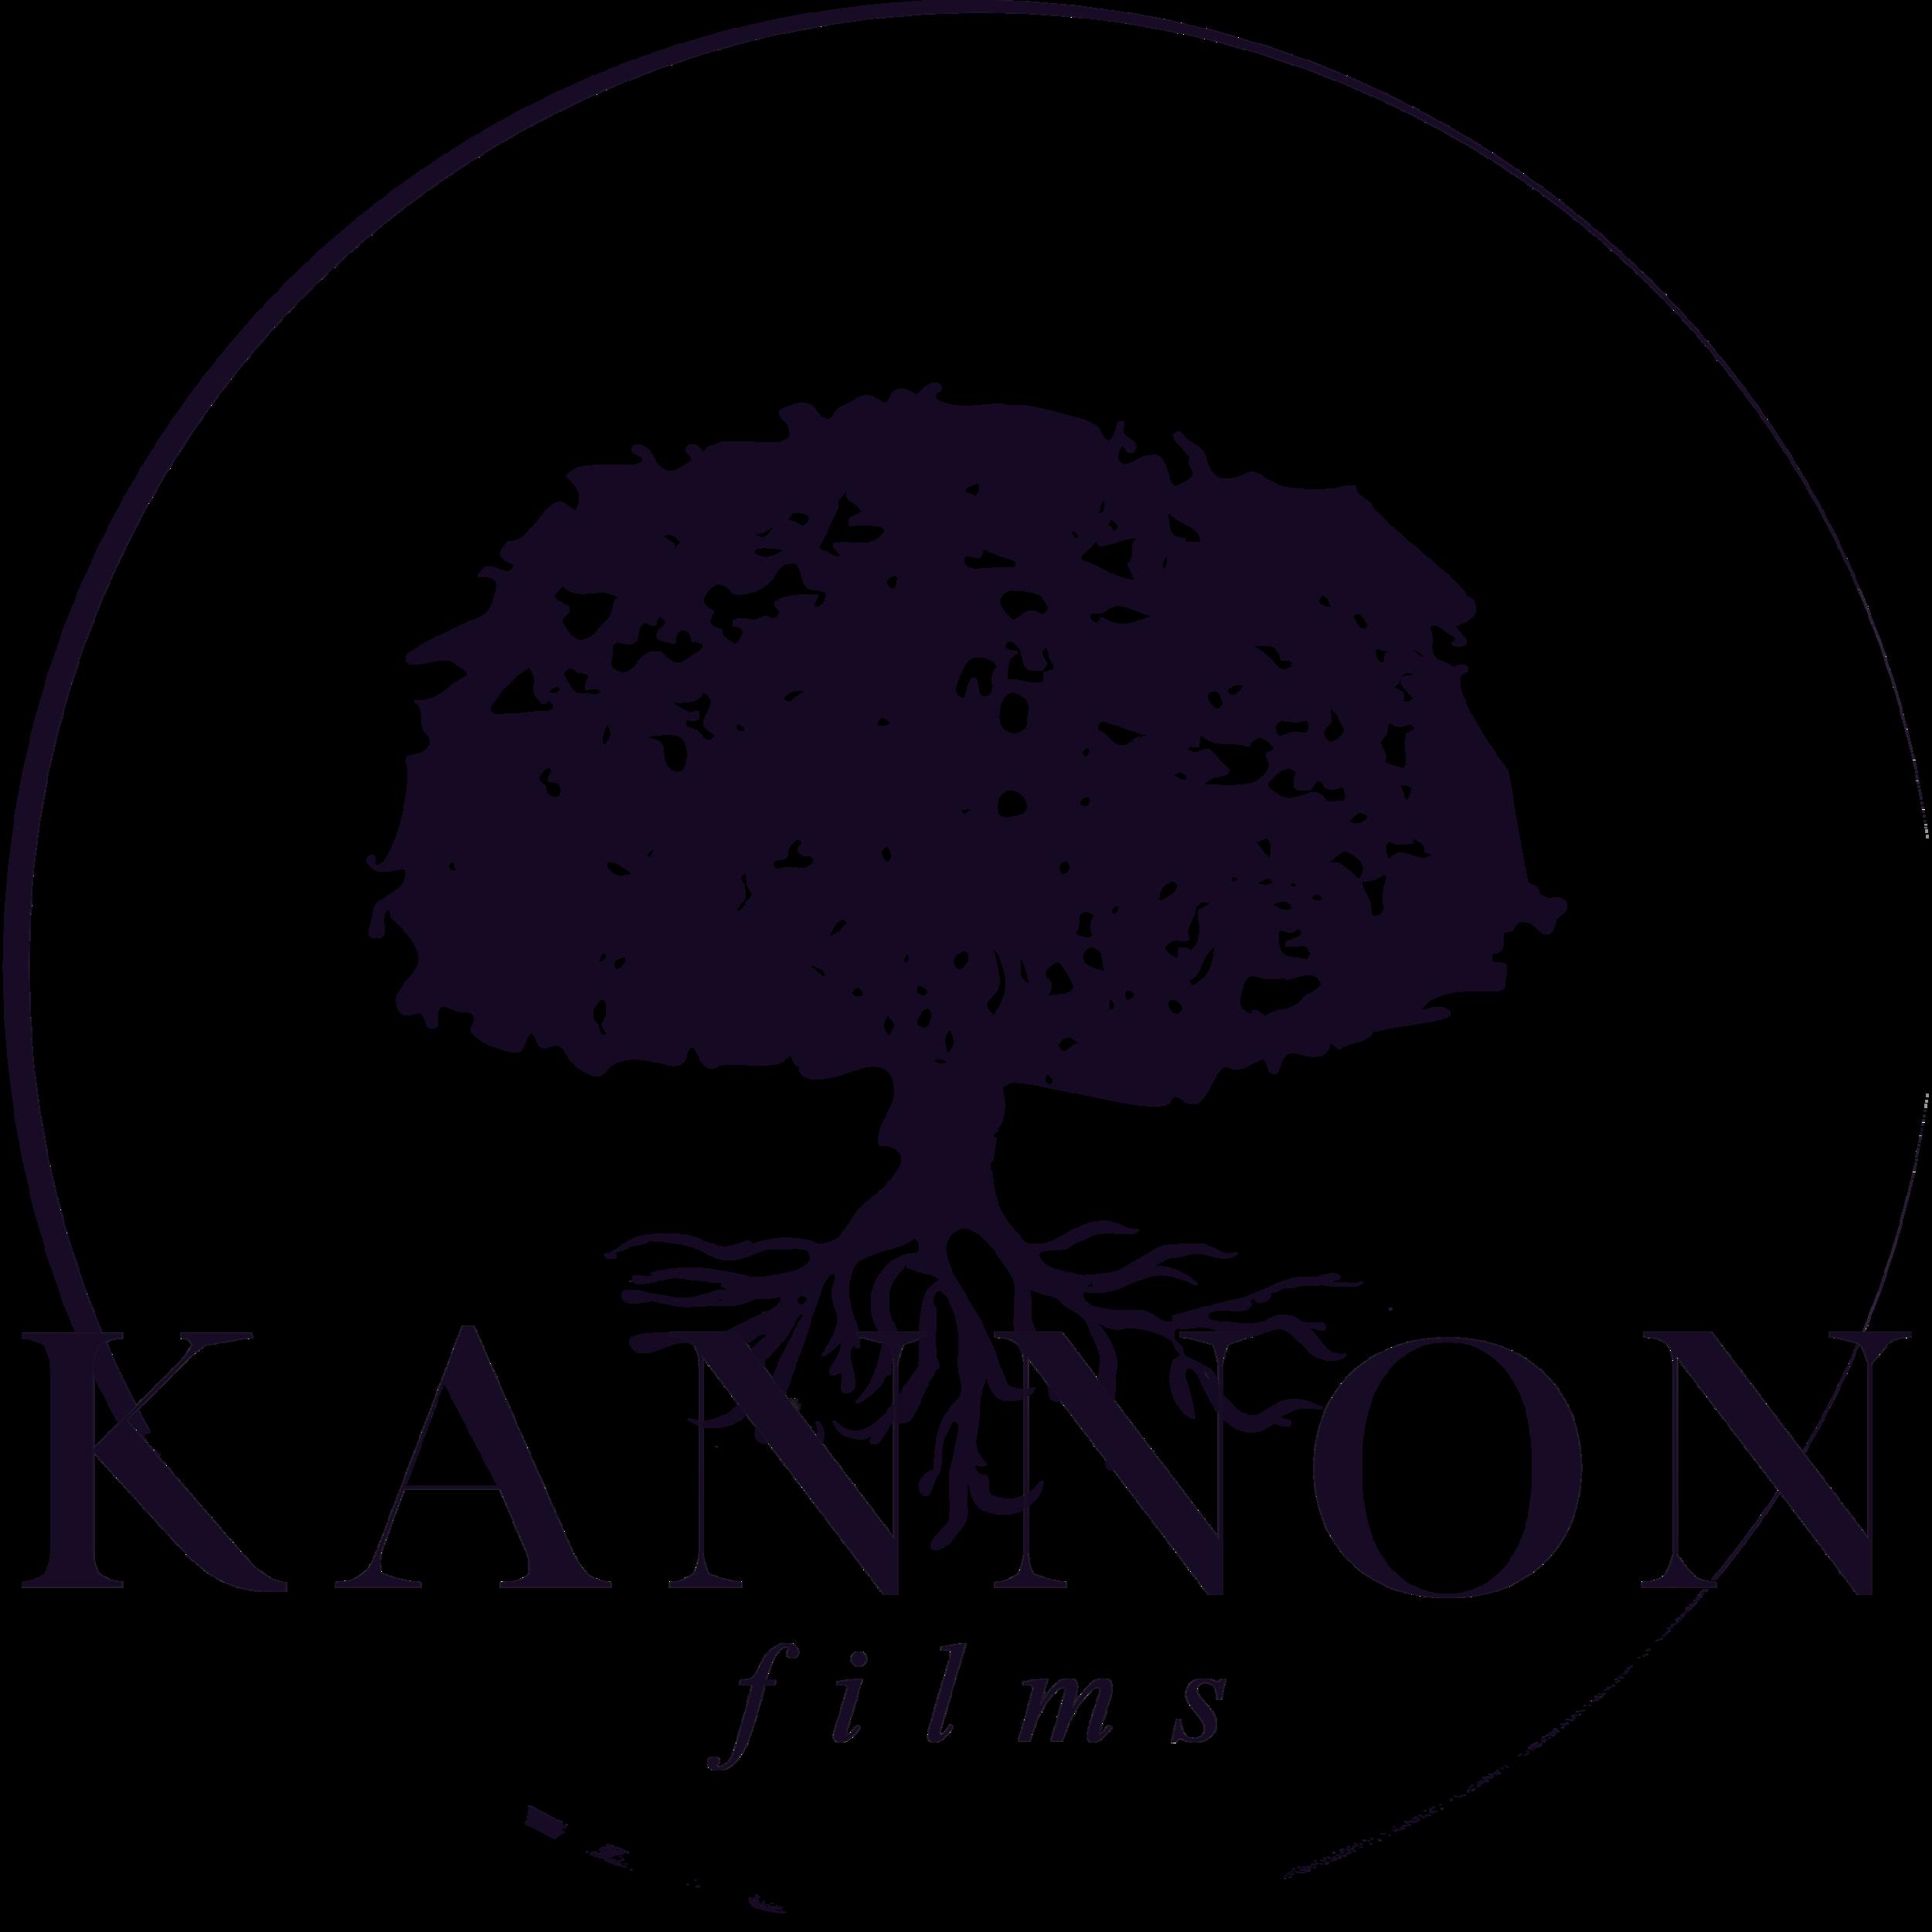 kannon_films_on white_back_v02.png